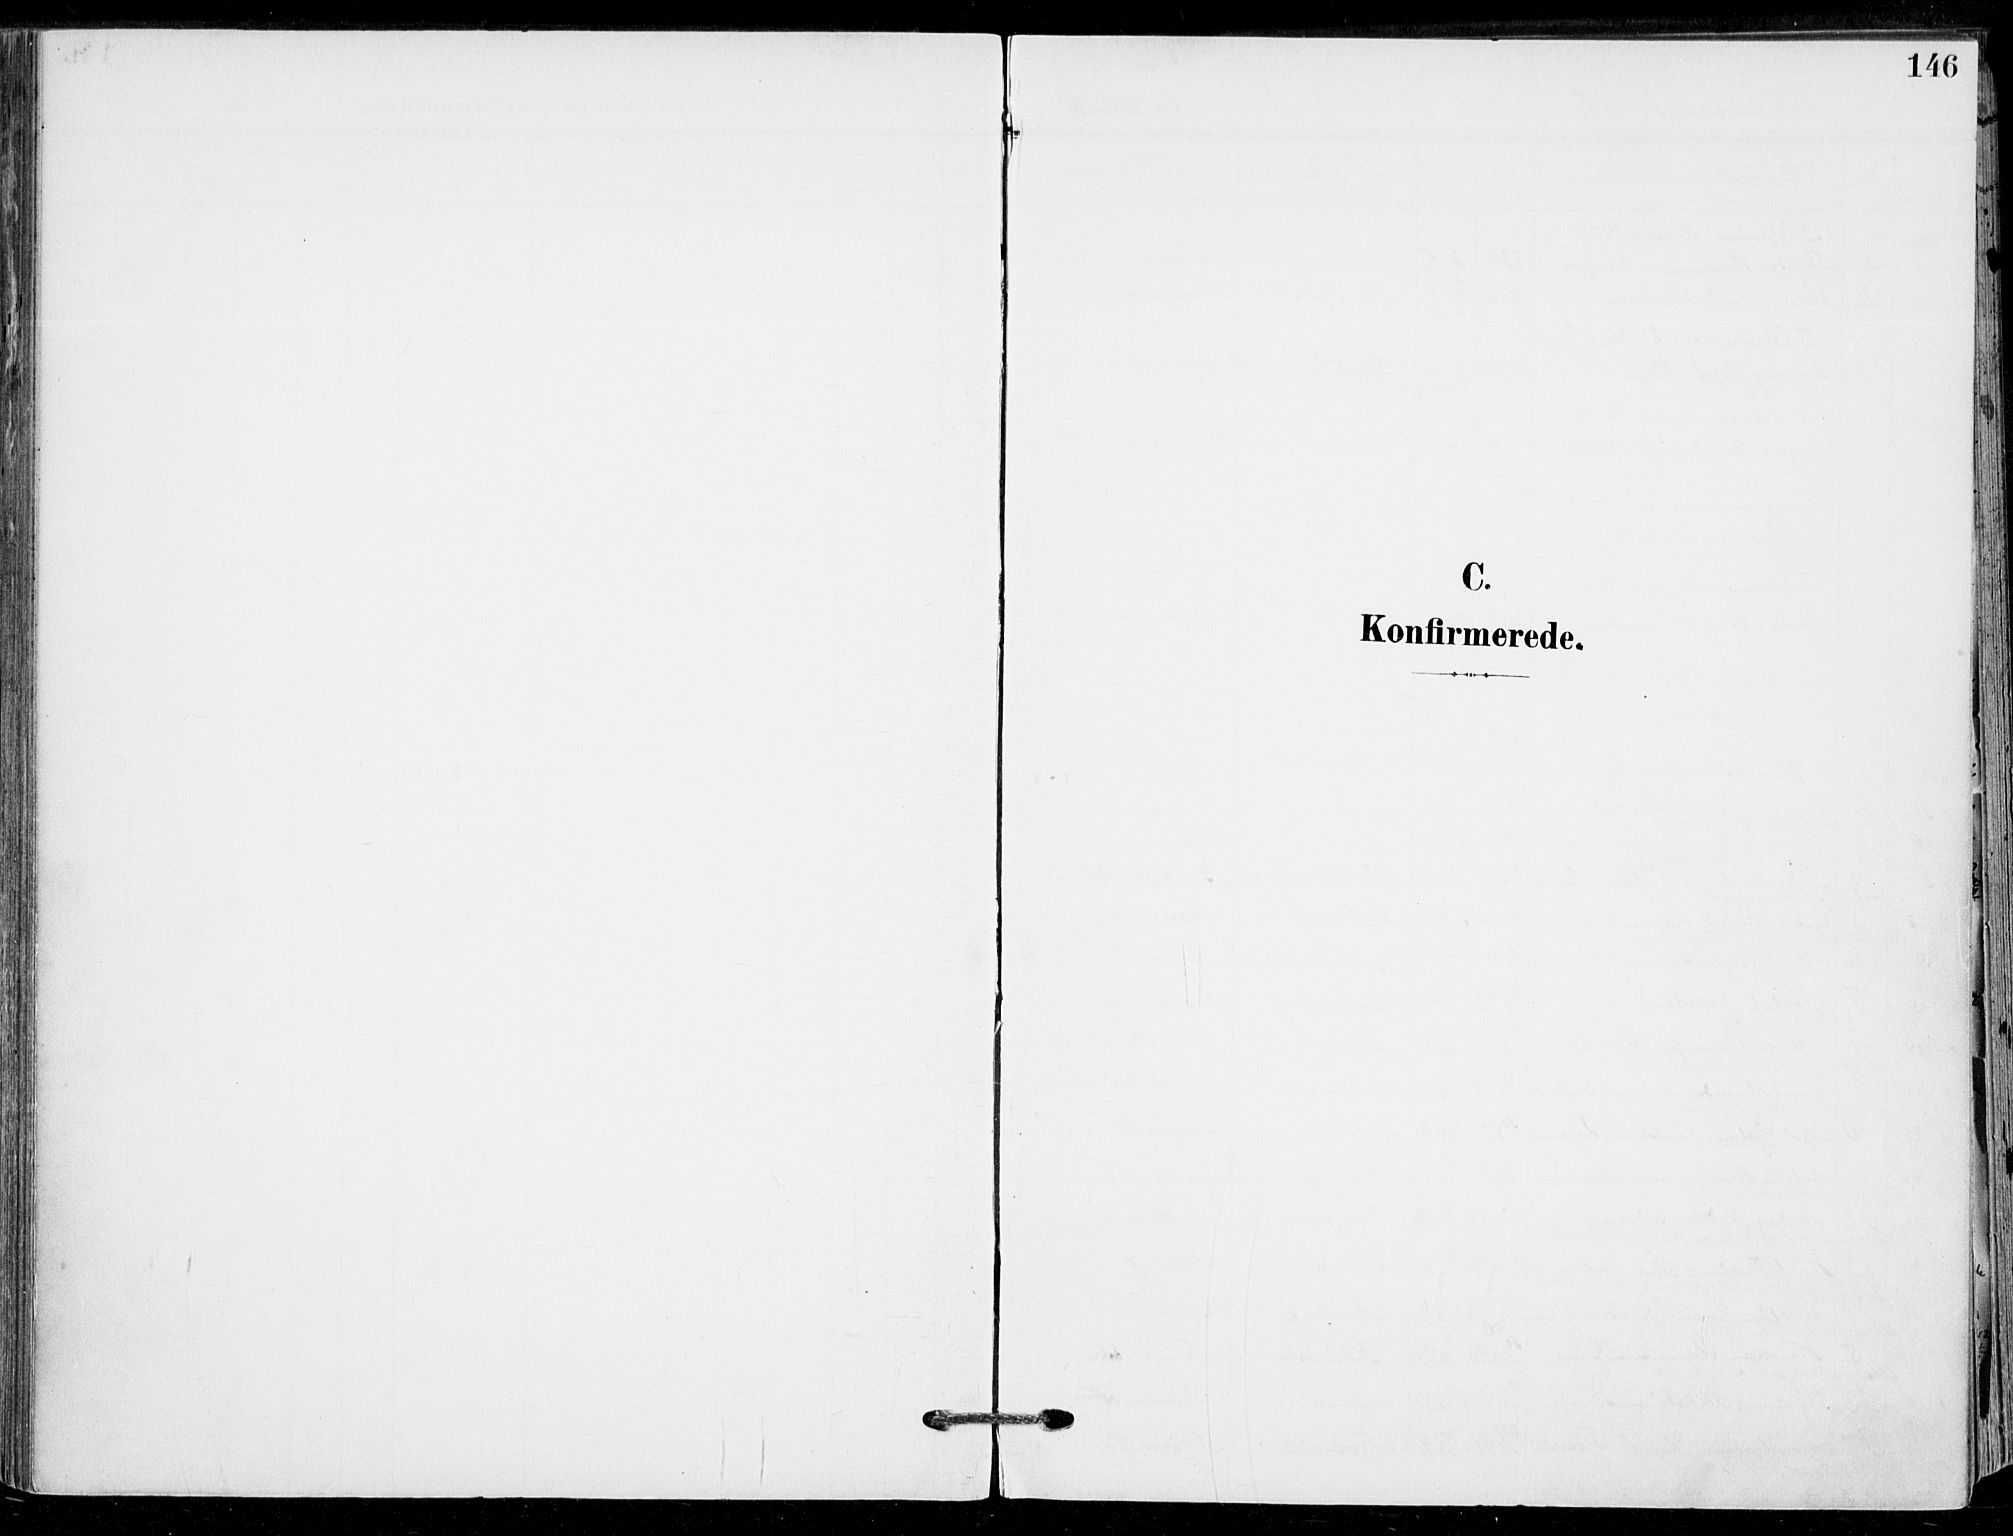 SAKO, Sande Kirkebøker, F/Fa/L0008: Parish register (official) no. 8, 1904-1921, p. 146